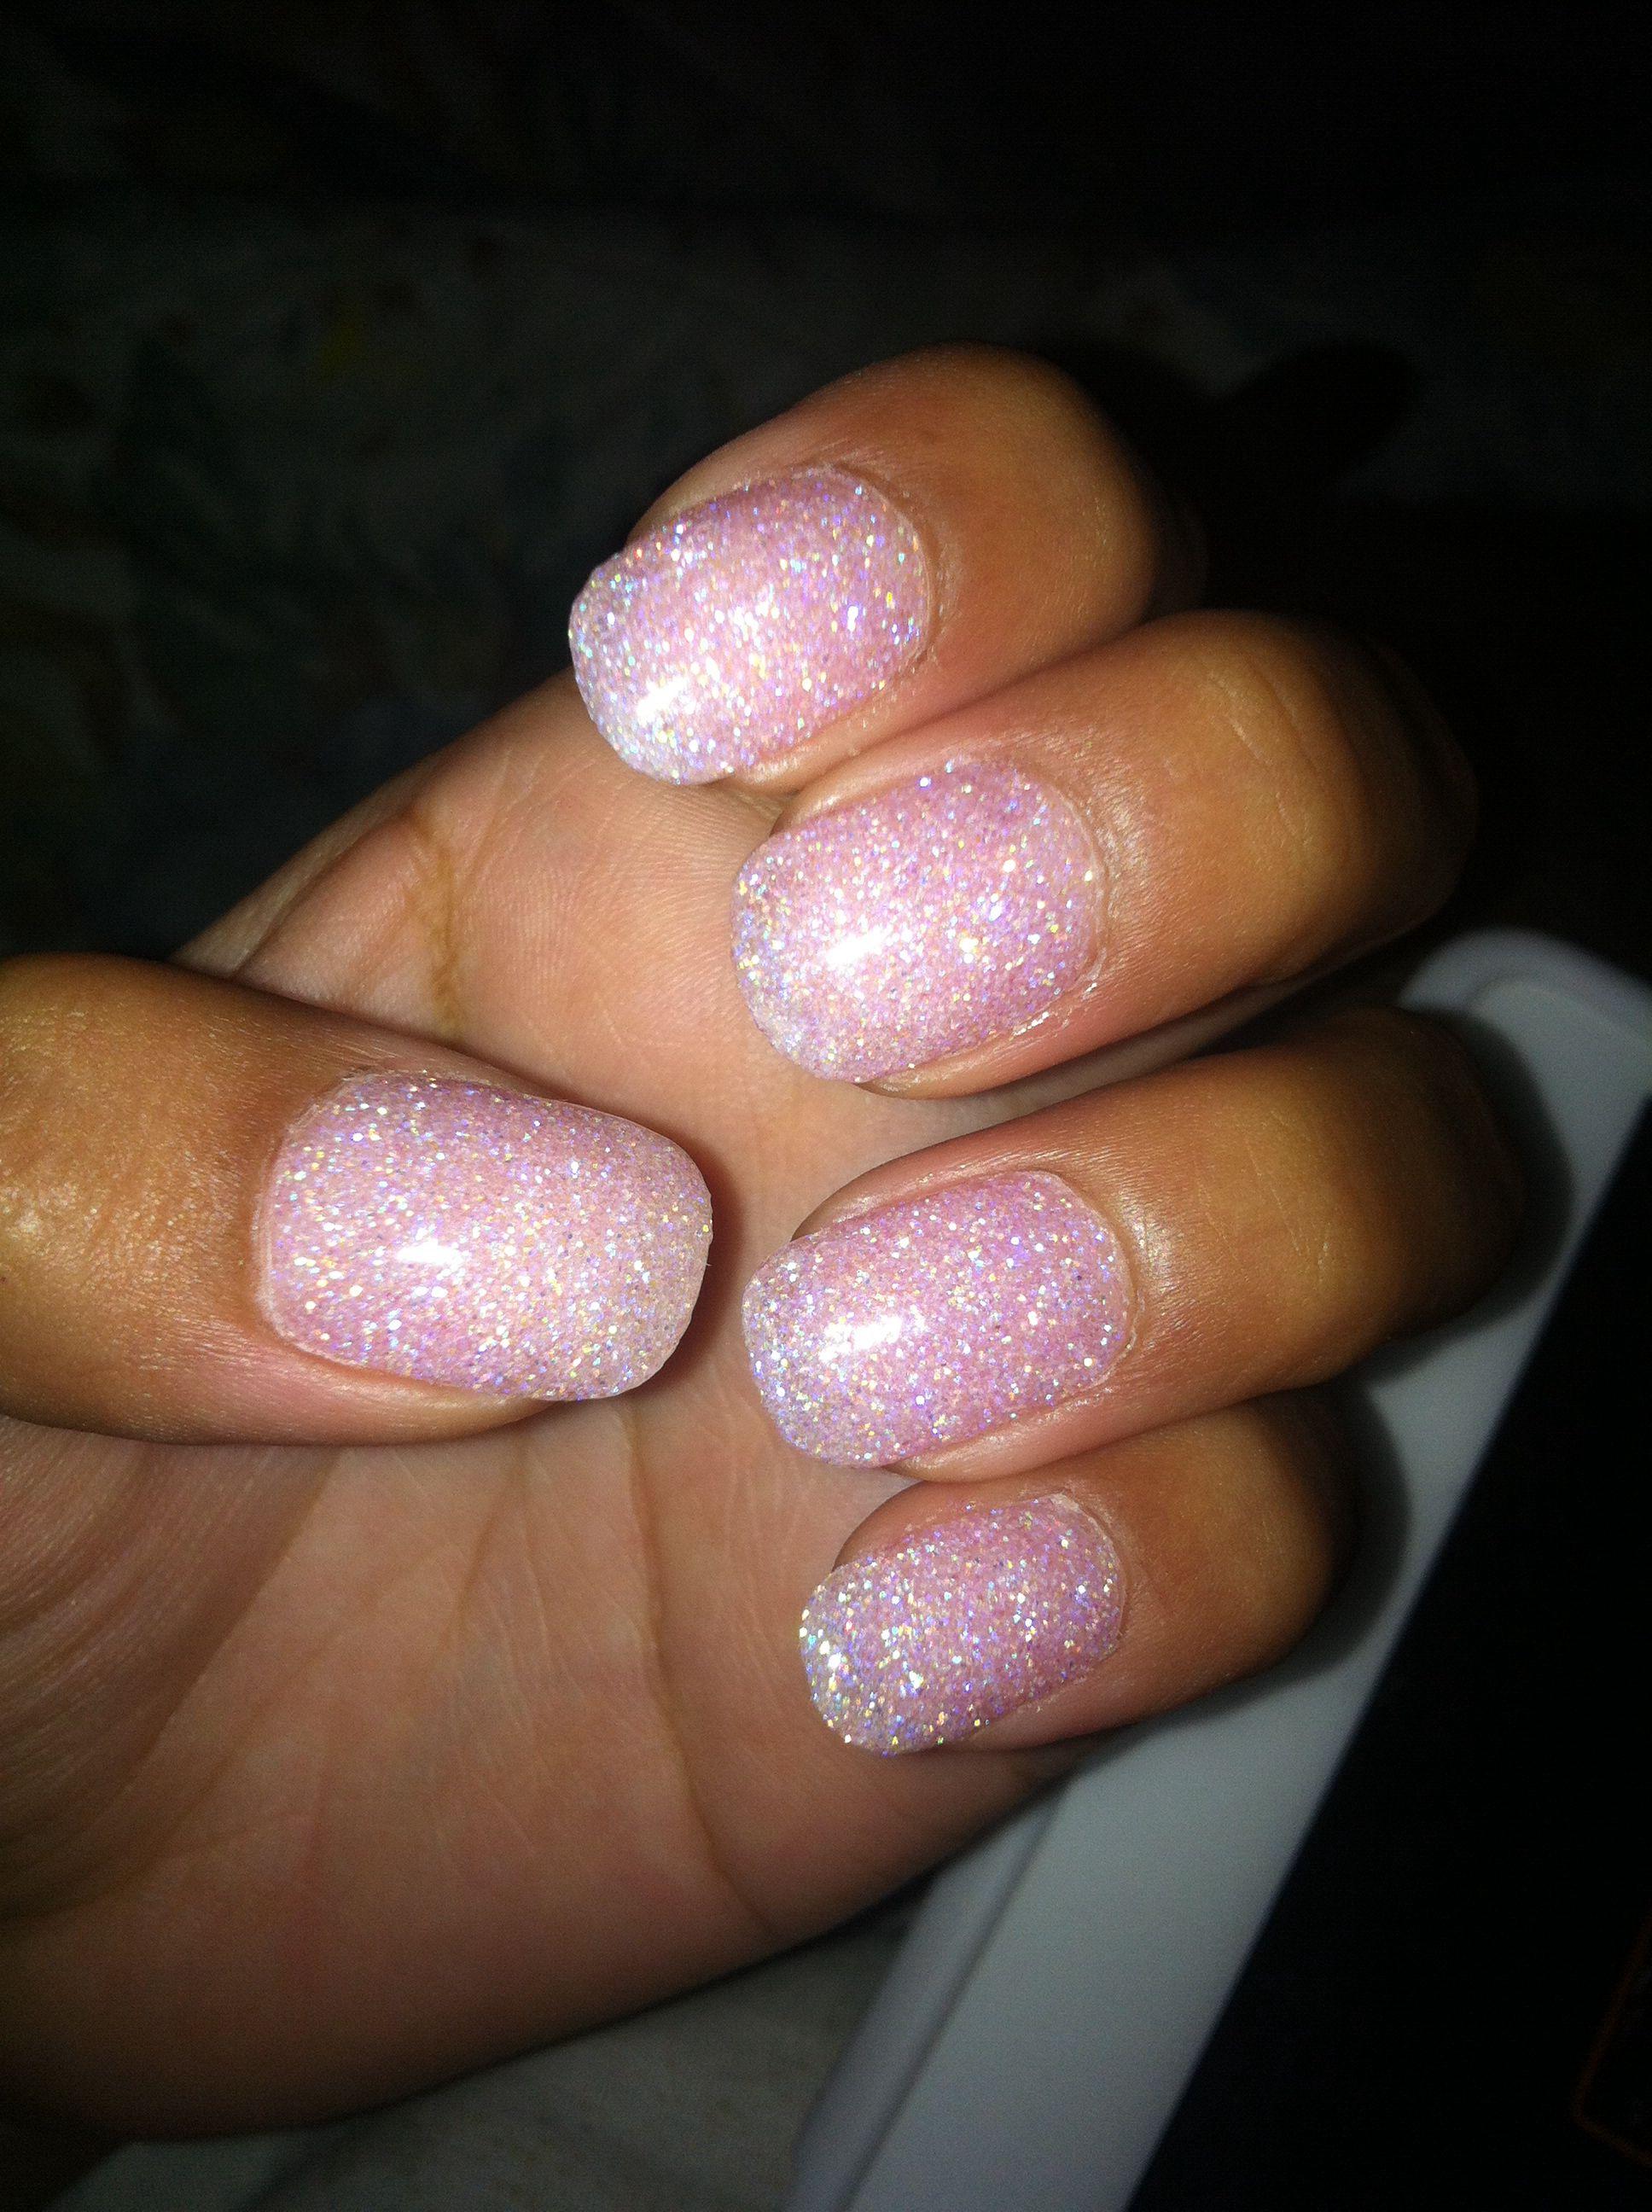 Powdered Gel Nails Design Vj Nails In Calgary Alberta: SNS Powder!! Very Beautiful Outcome, Love Them!